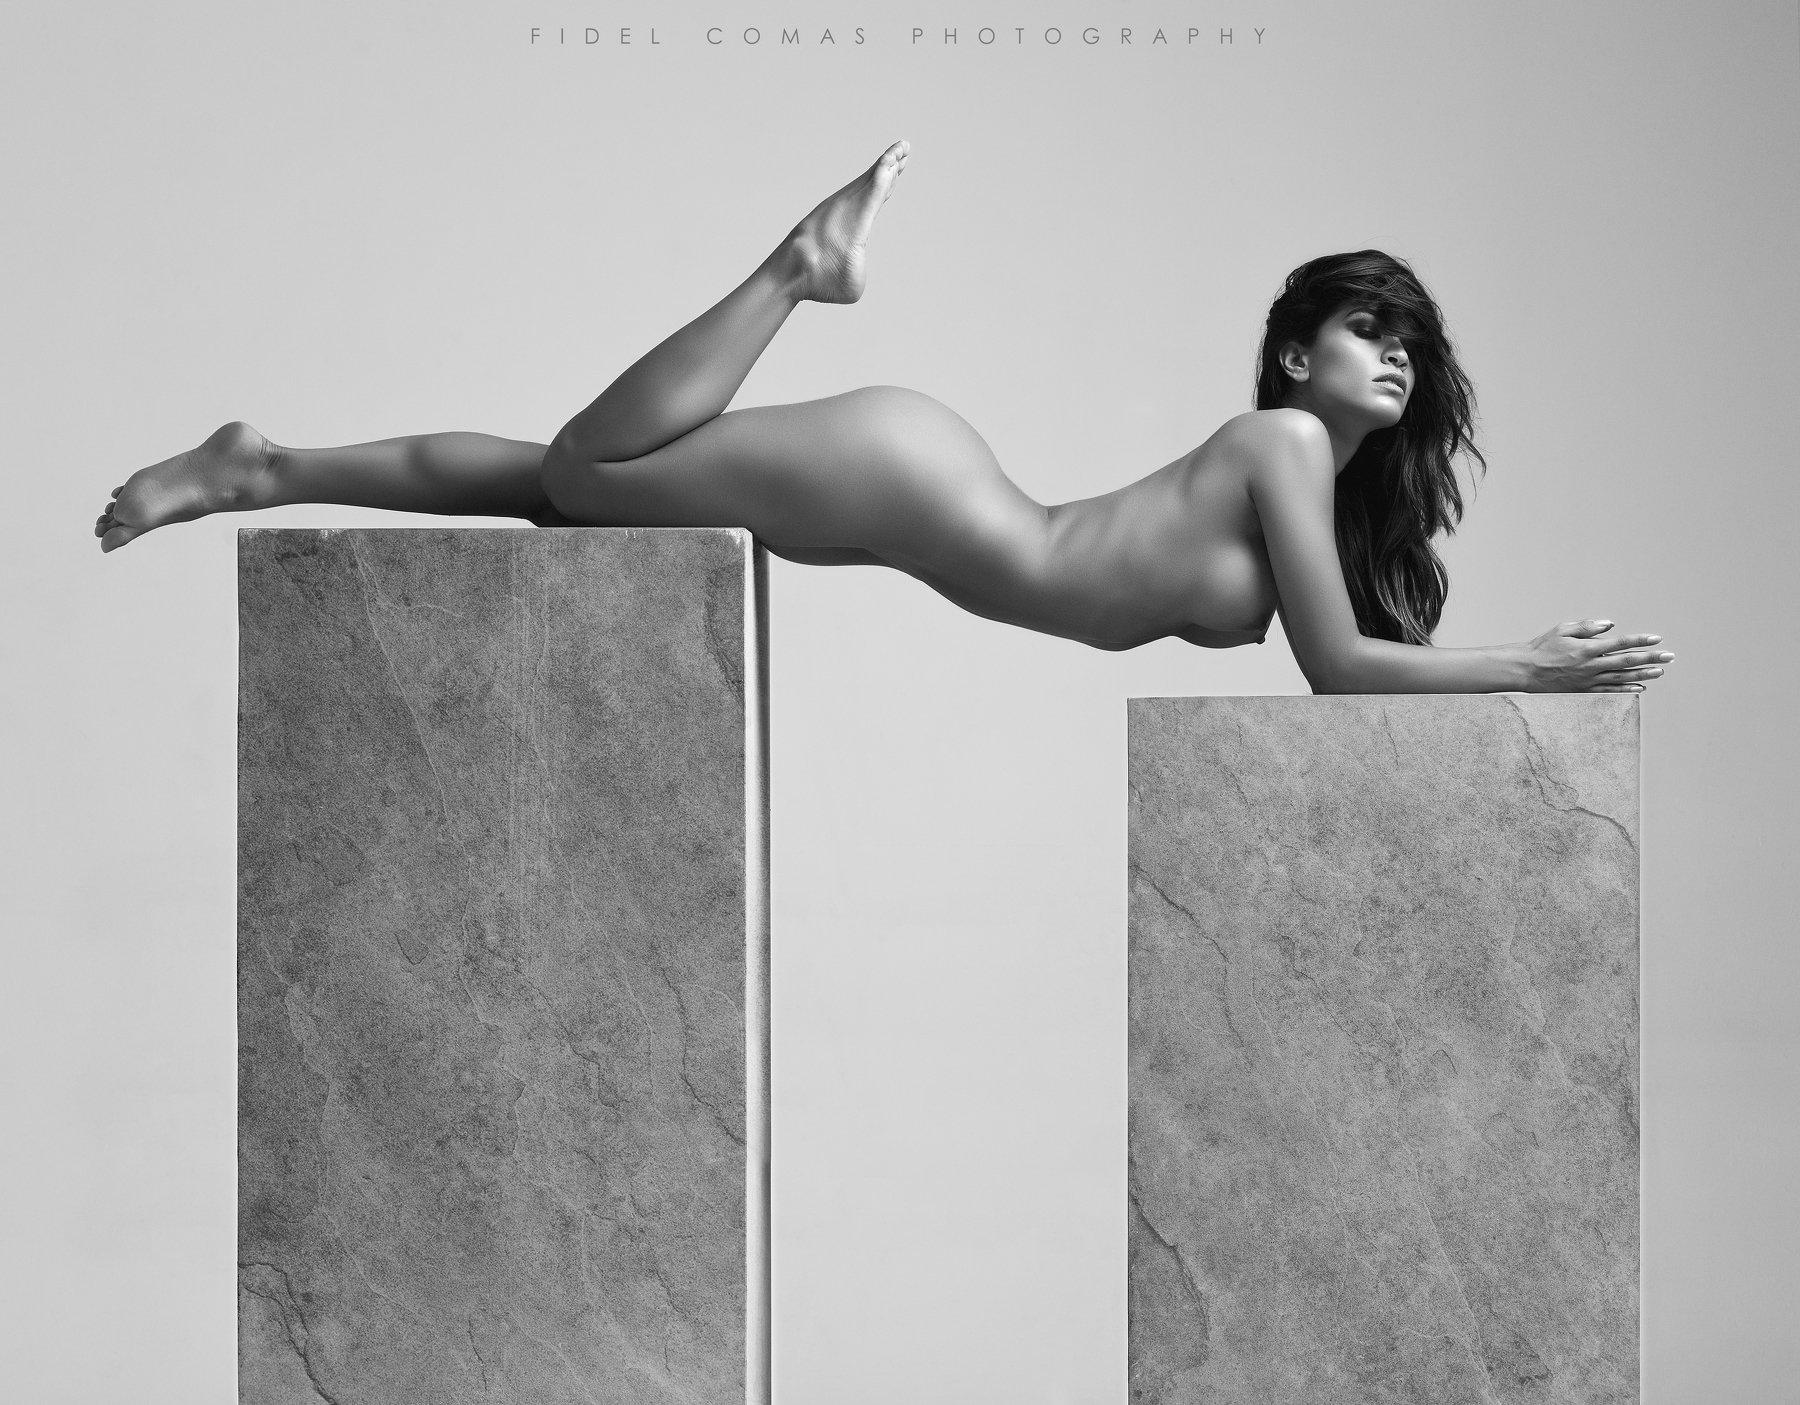 monochrome, studio, model, art, Fidel Comas